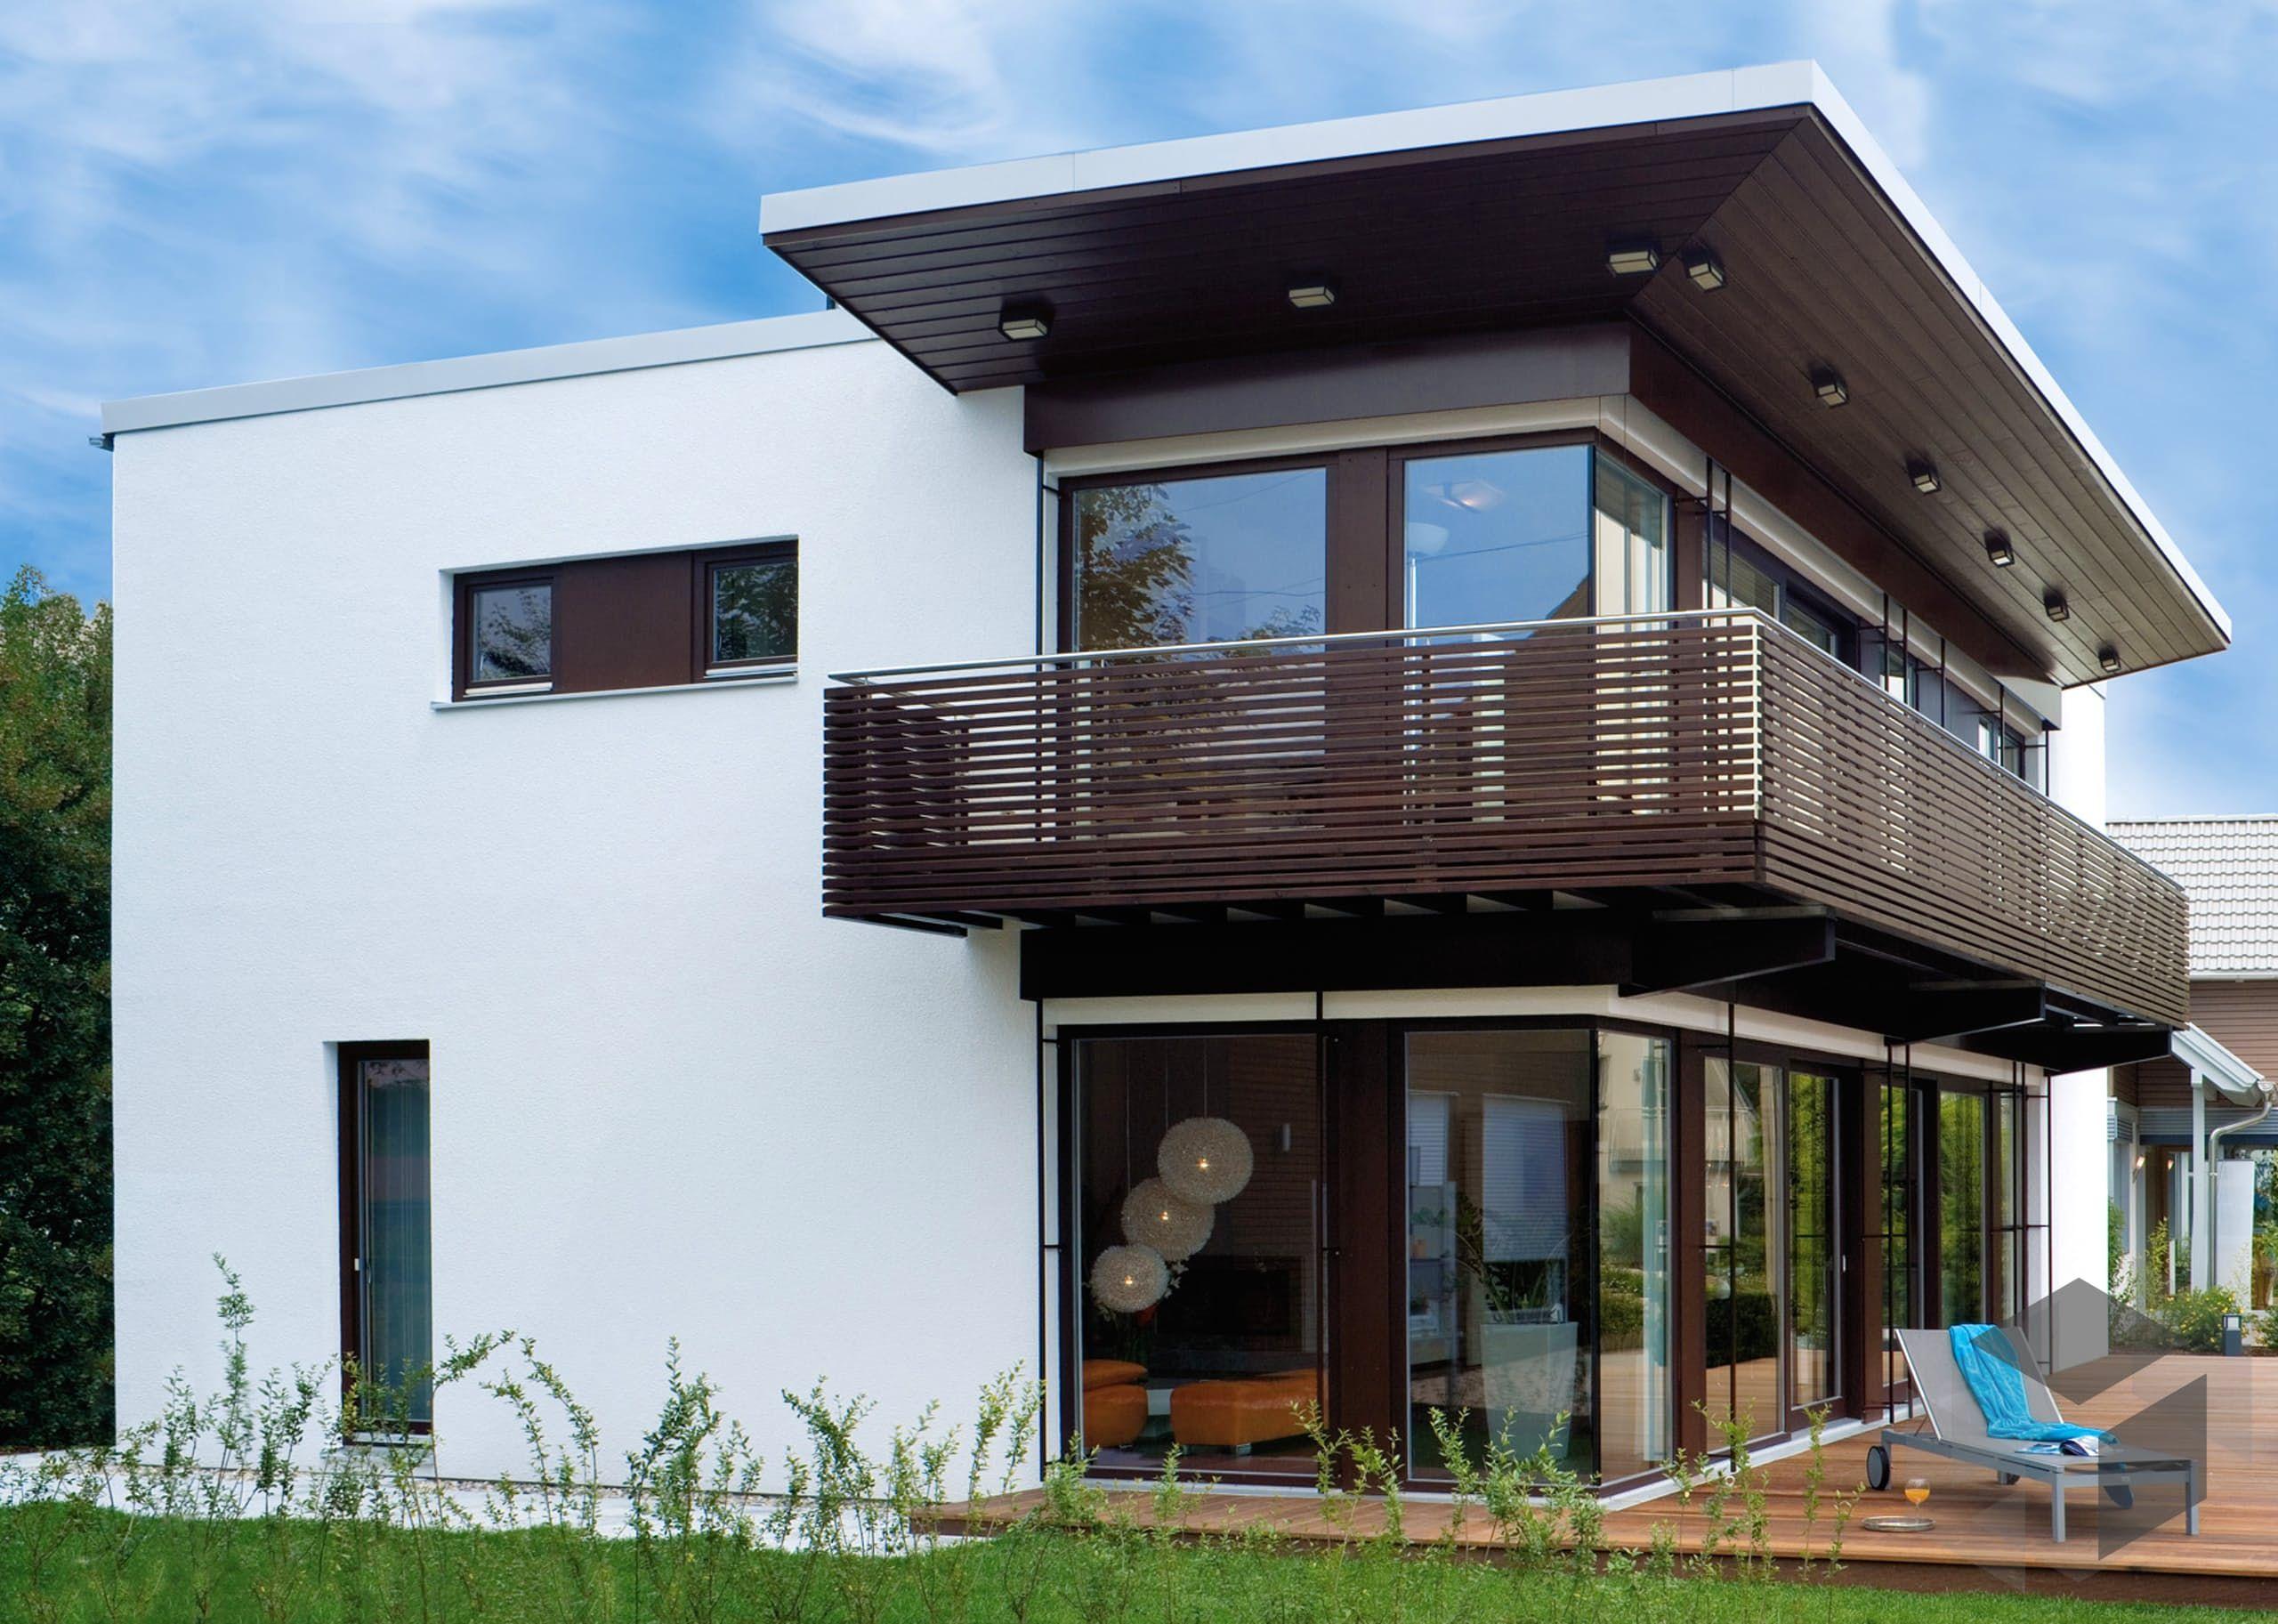 Kubushaus 'VitaCube' von Regnauer Hausbau Alle Infos